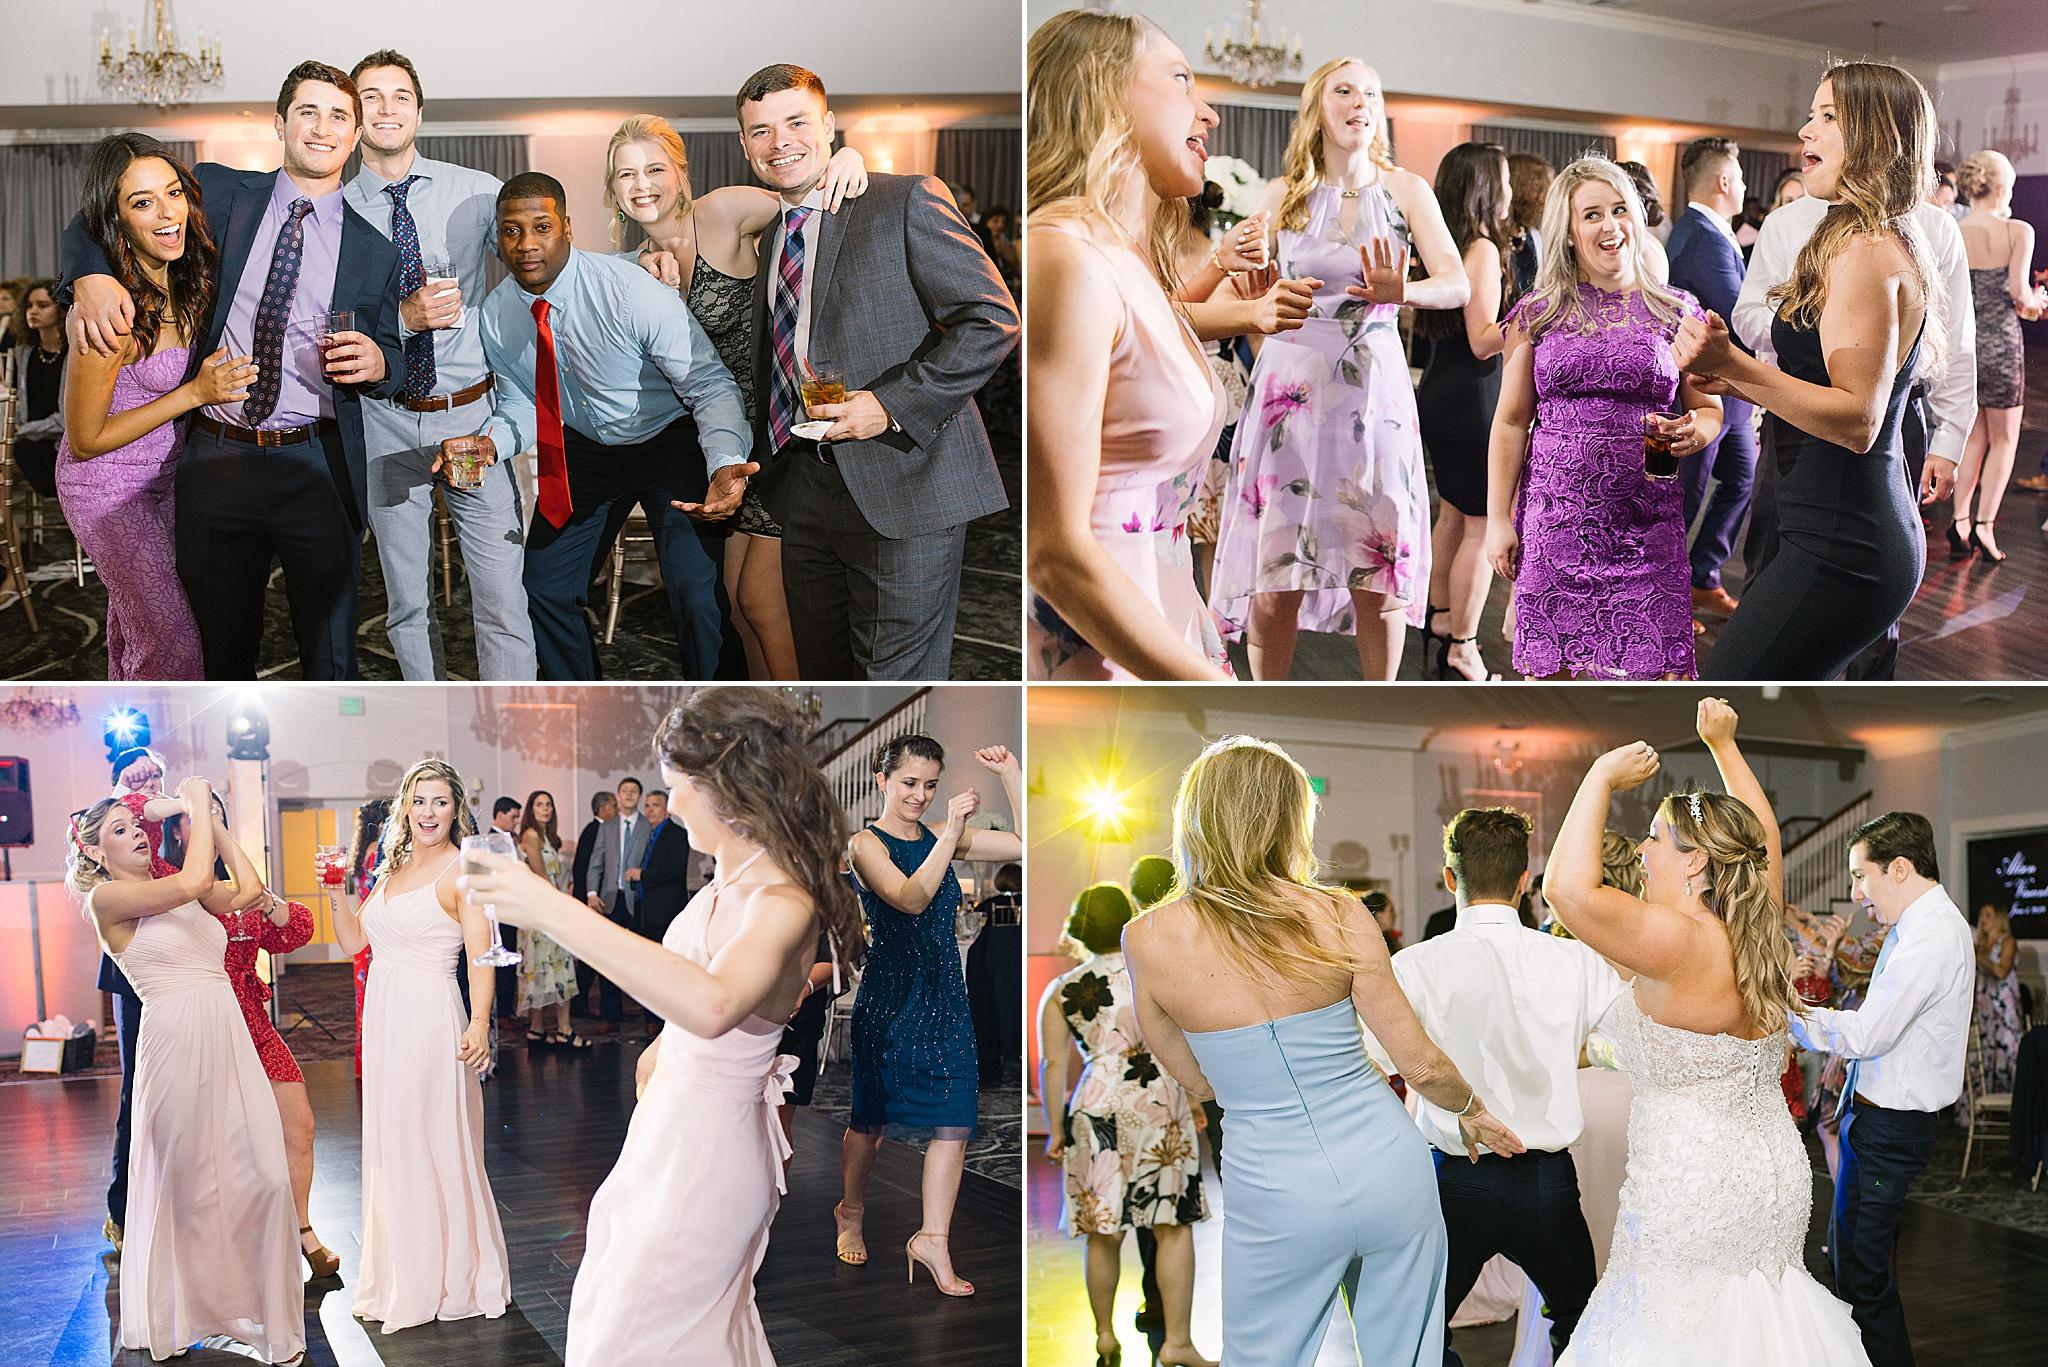 Ashley Mac Photographs | The Mansion at Mountain Lakes | Mountain Lakes NJ wedding | NJ wedding photographer | New Jersey wedding day | New Jersey wedding photographer | Mountain Lake New Jersey wedding | Mountain Lakes | classic wedding